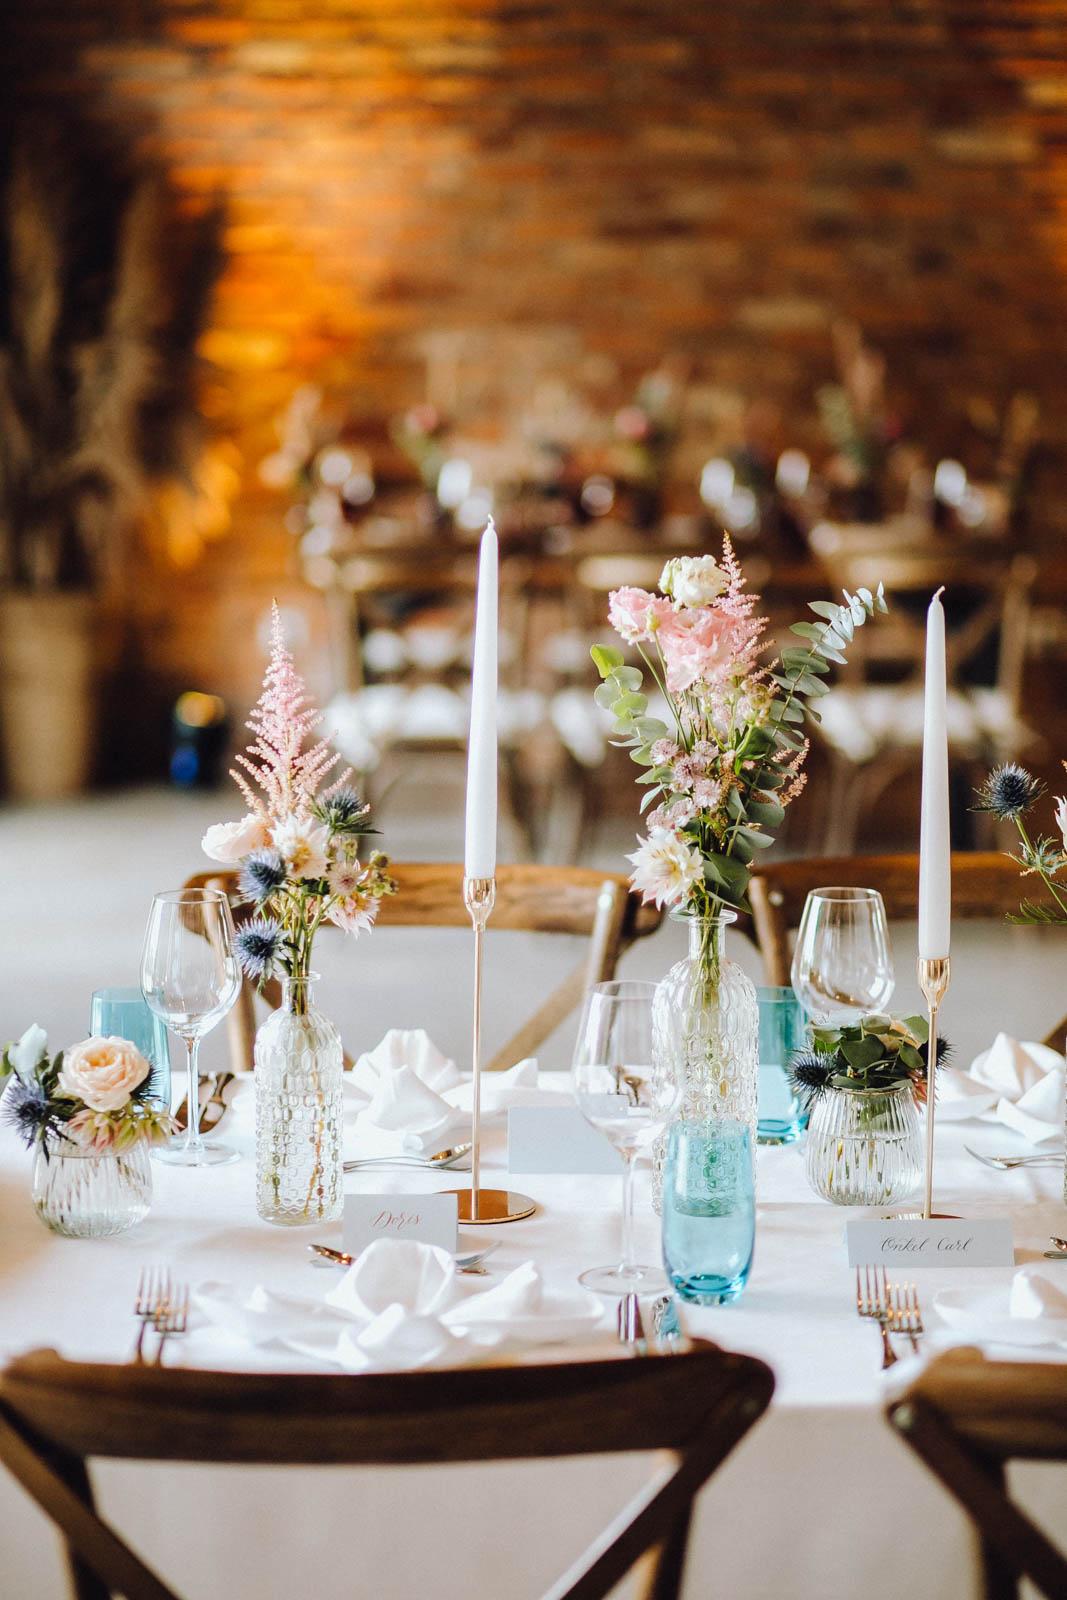 Hochzeits-Trendfarbe Rose Quartz & Serenity